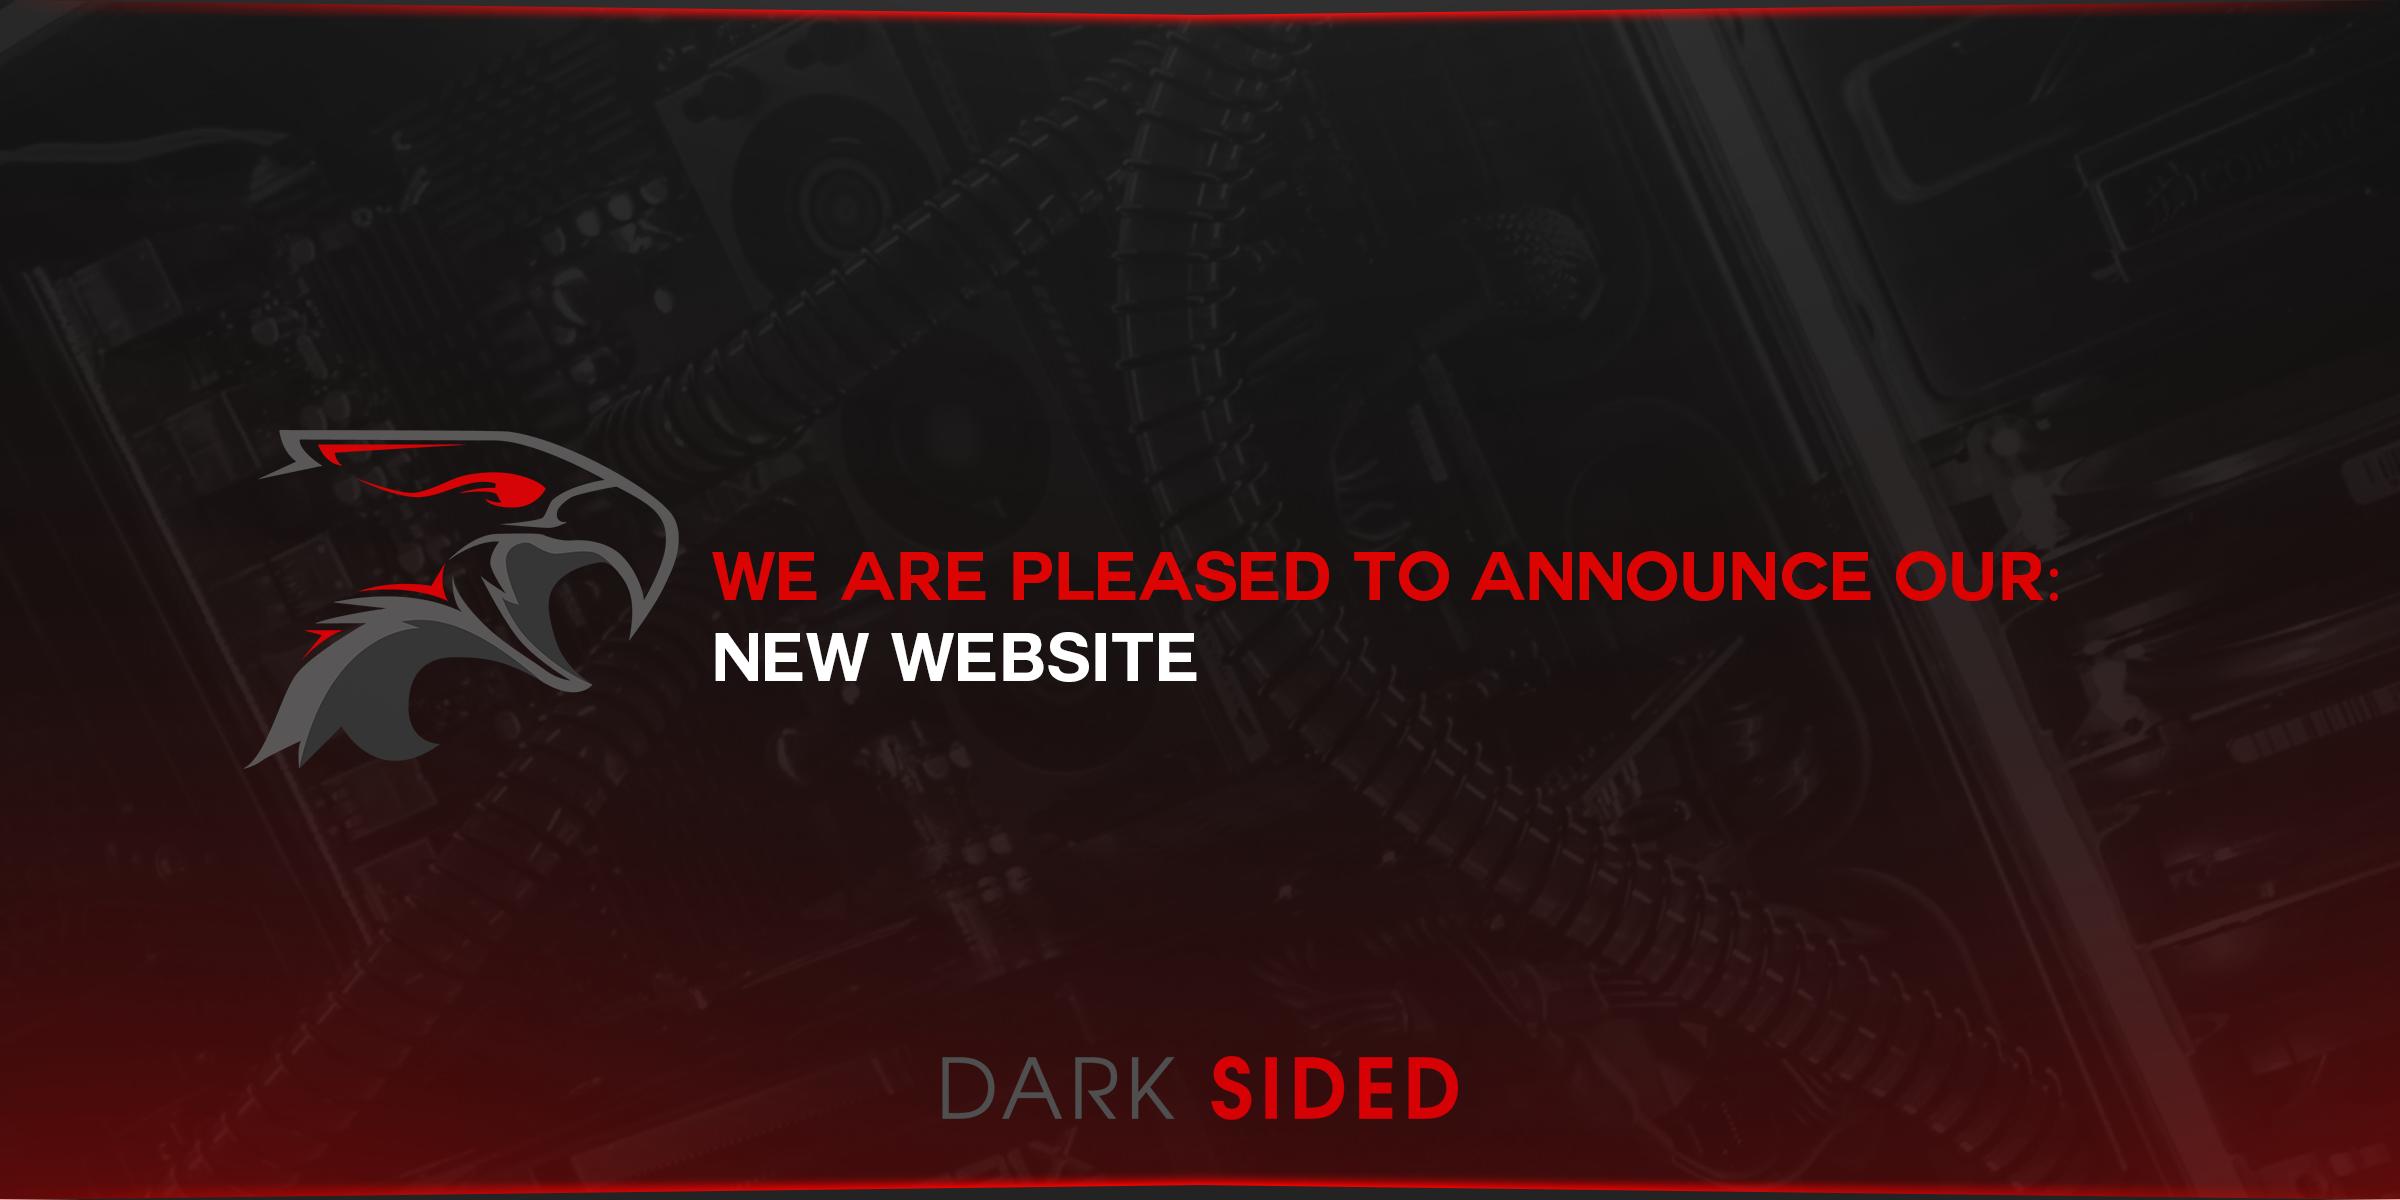 Dark Sided - Australia's professional esports organisation